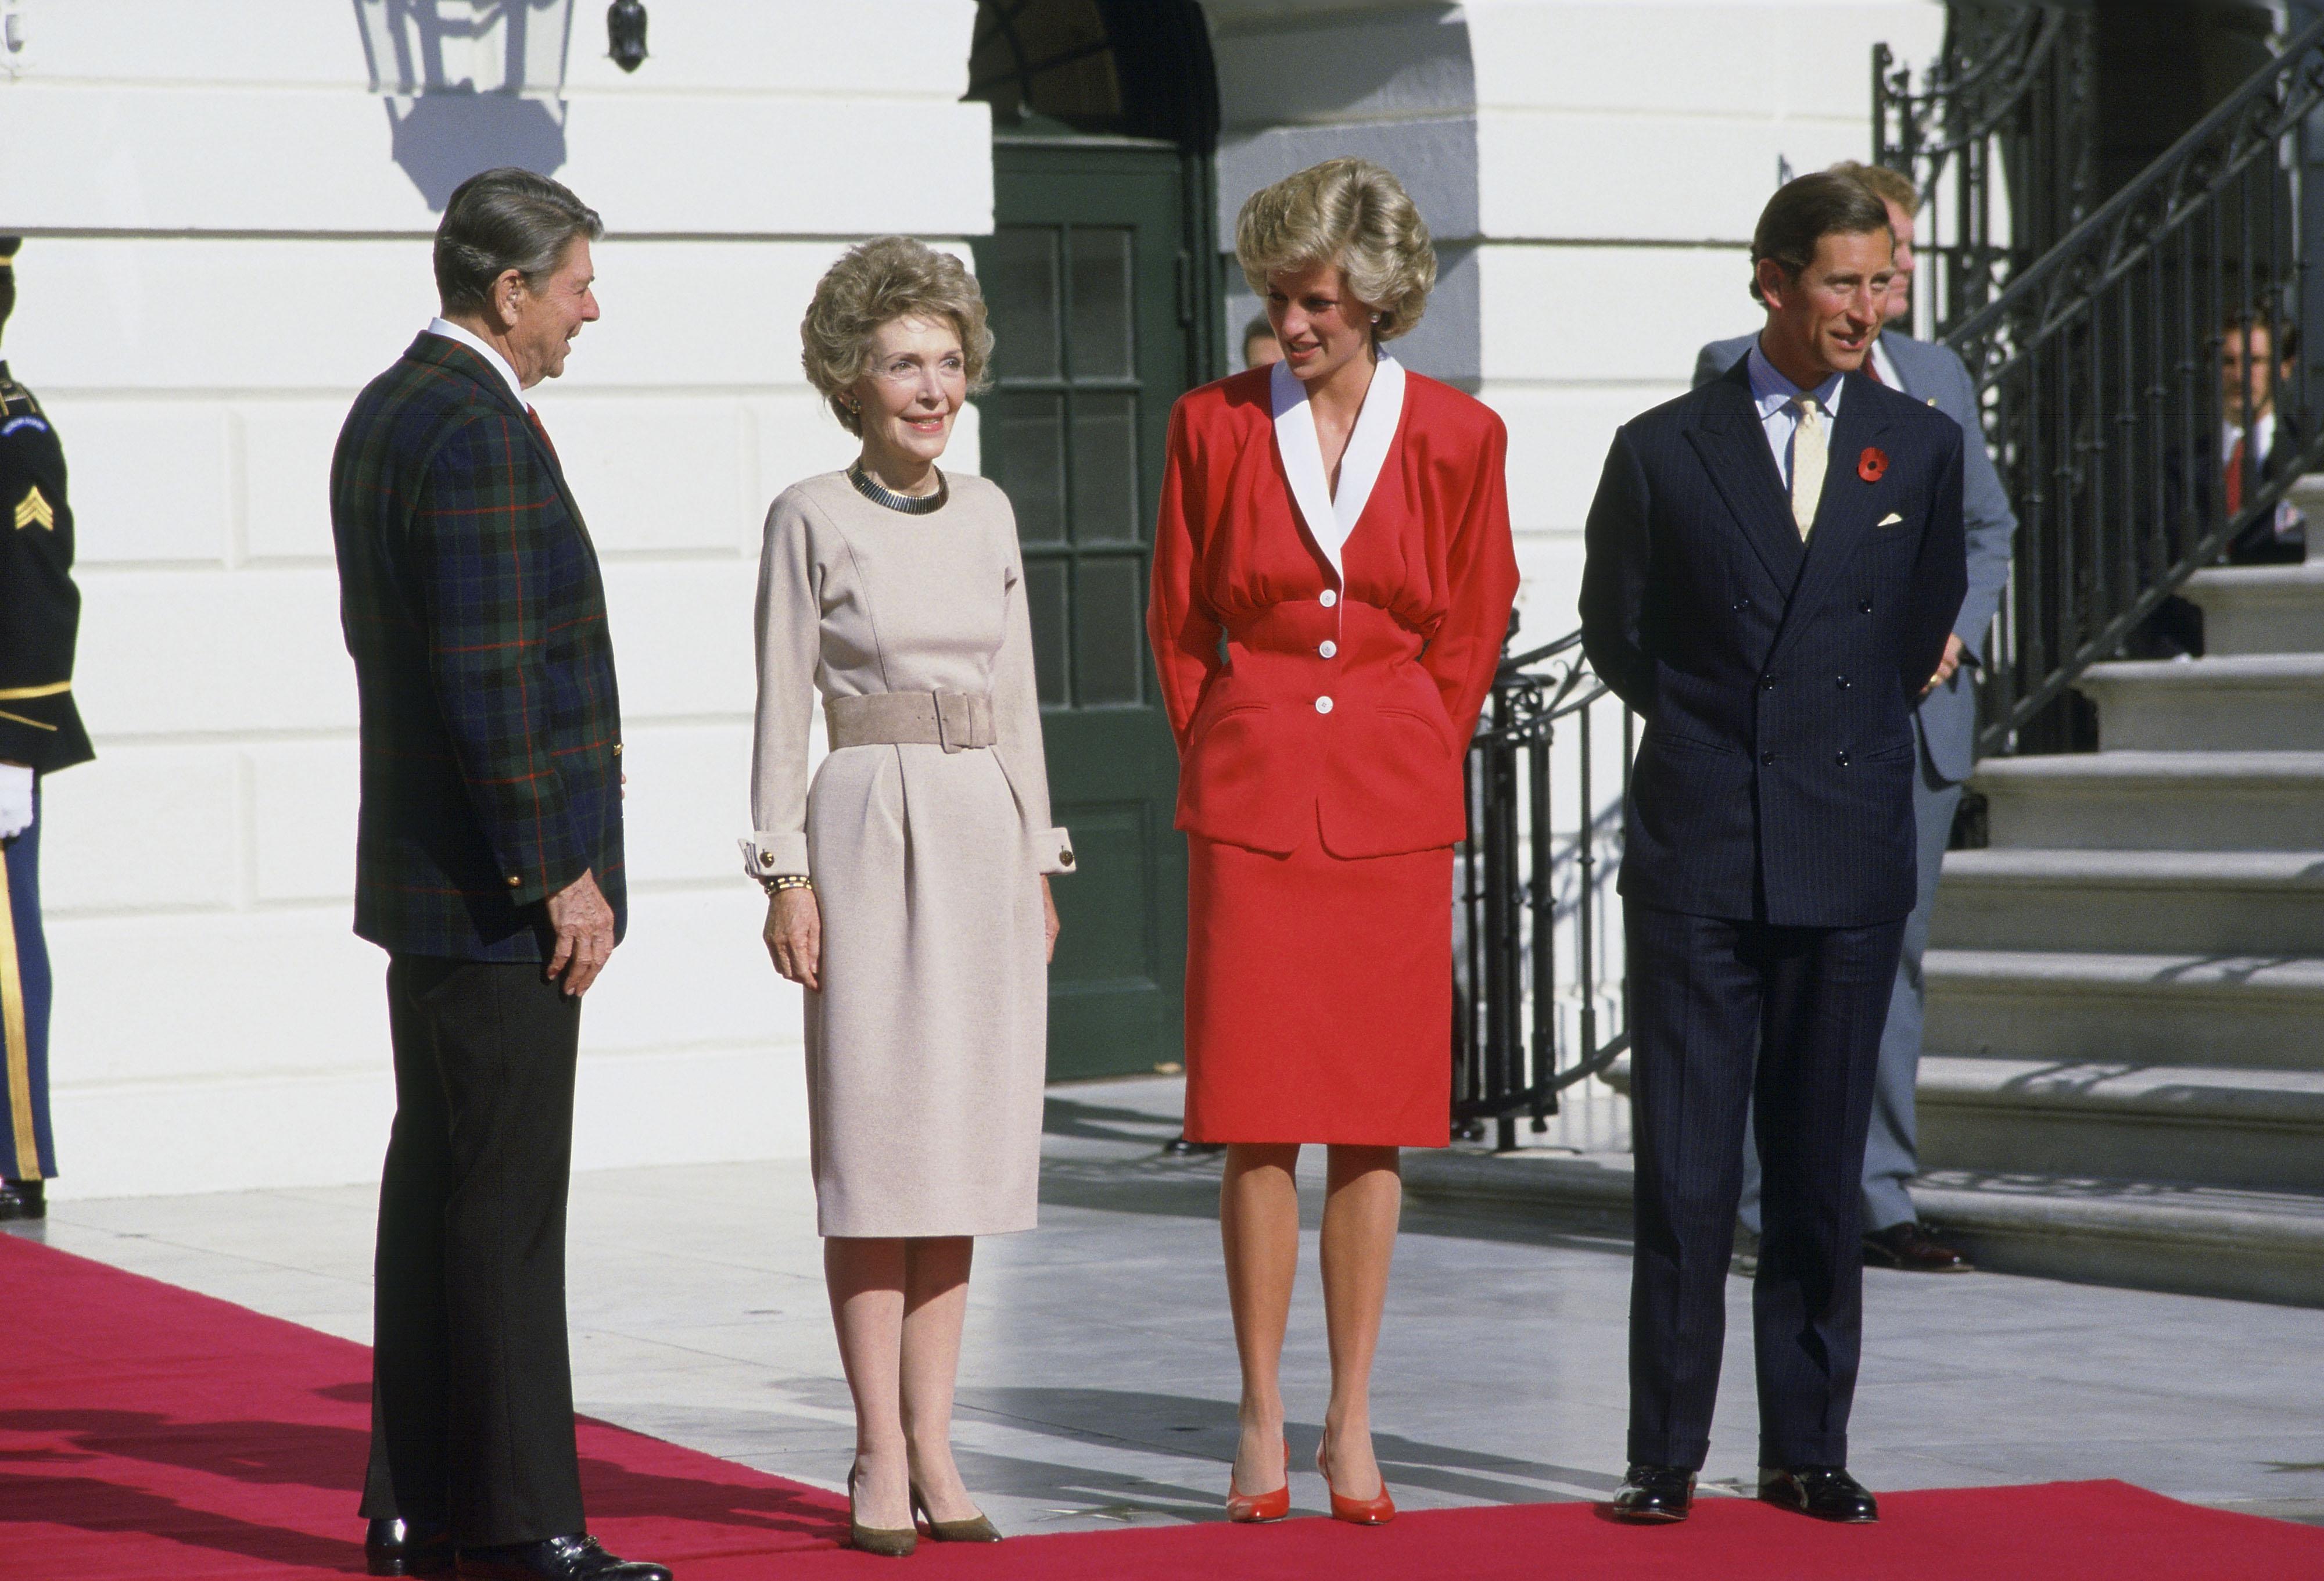 royal couple us pres getty